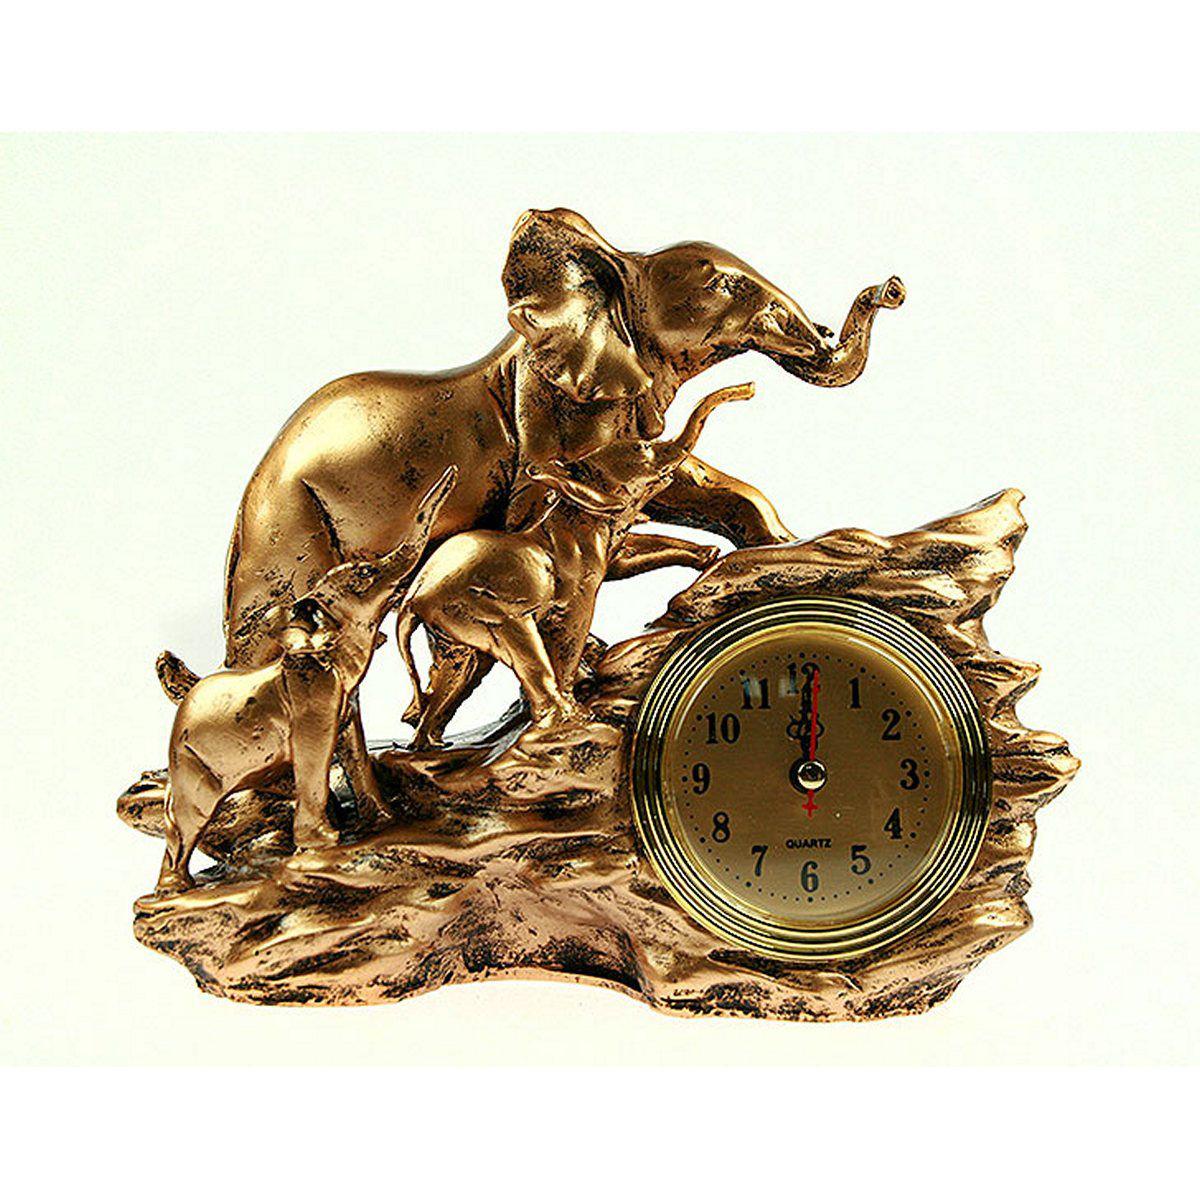 Часы настольные Русские Подарки Слоны, 24 х 9 х 19 см. 59368